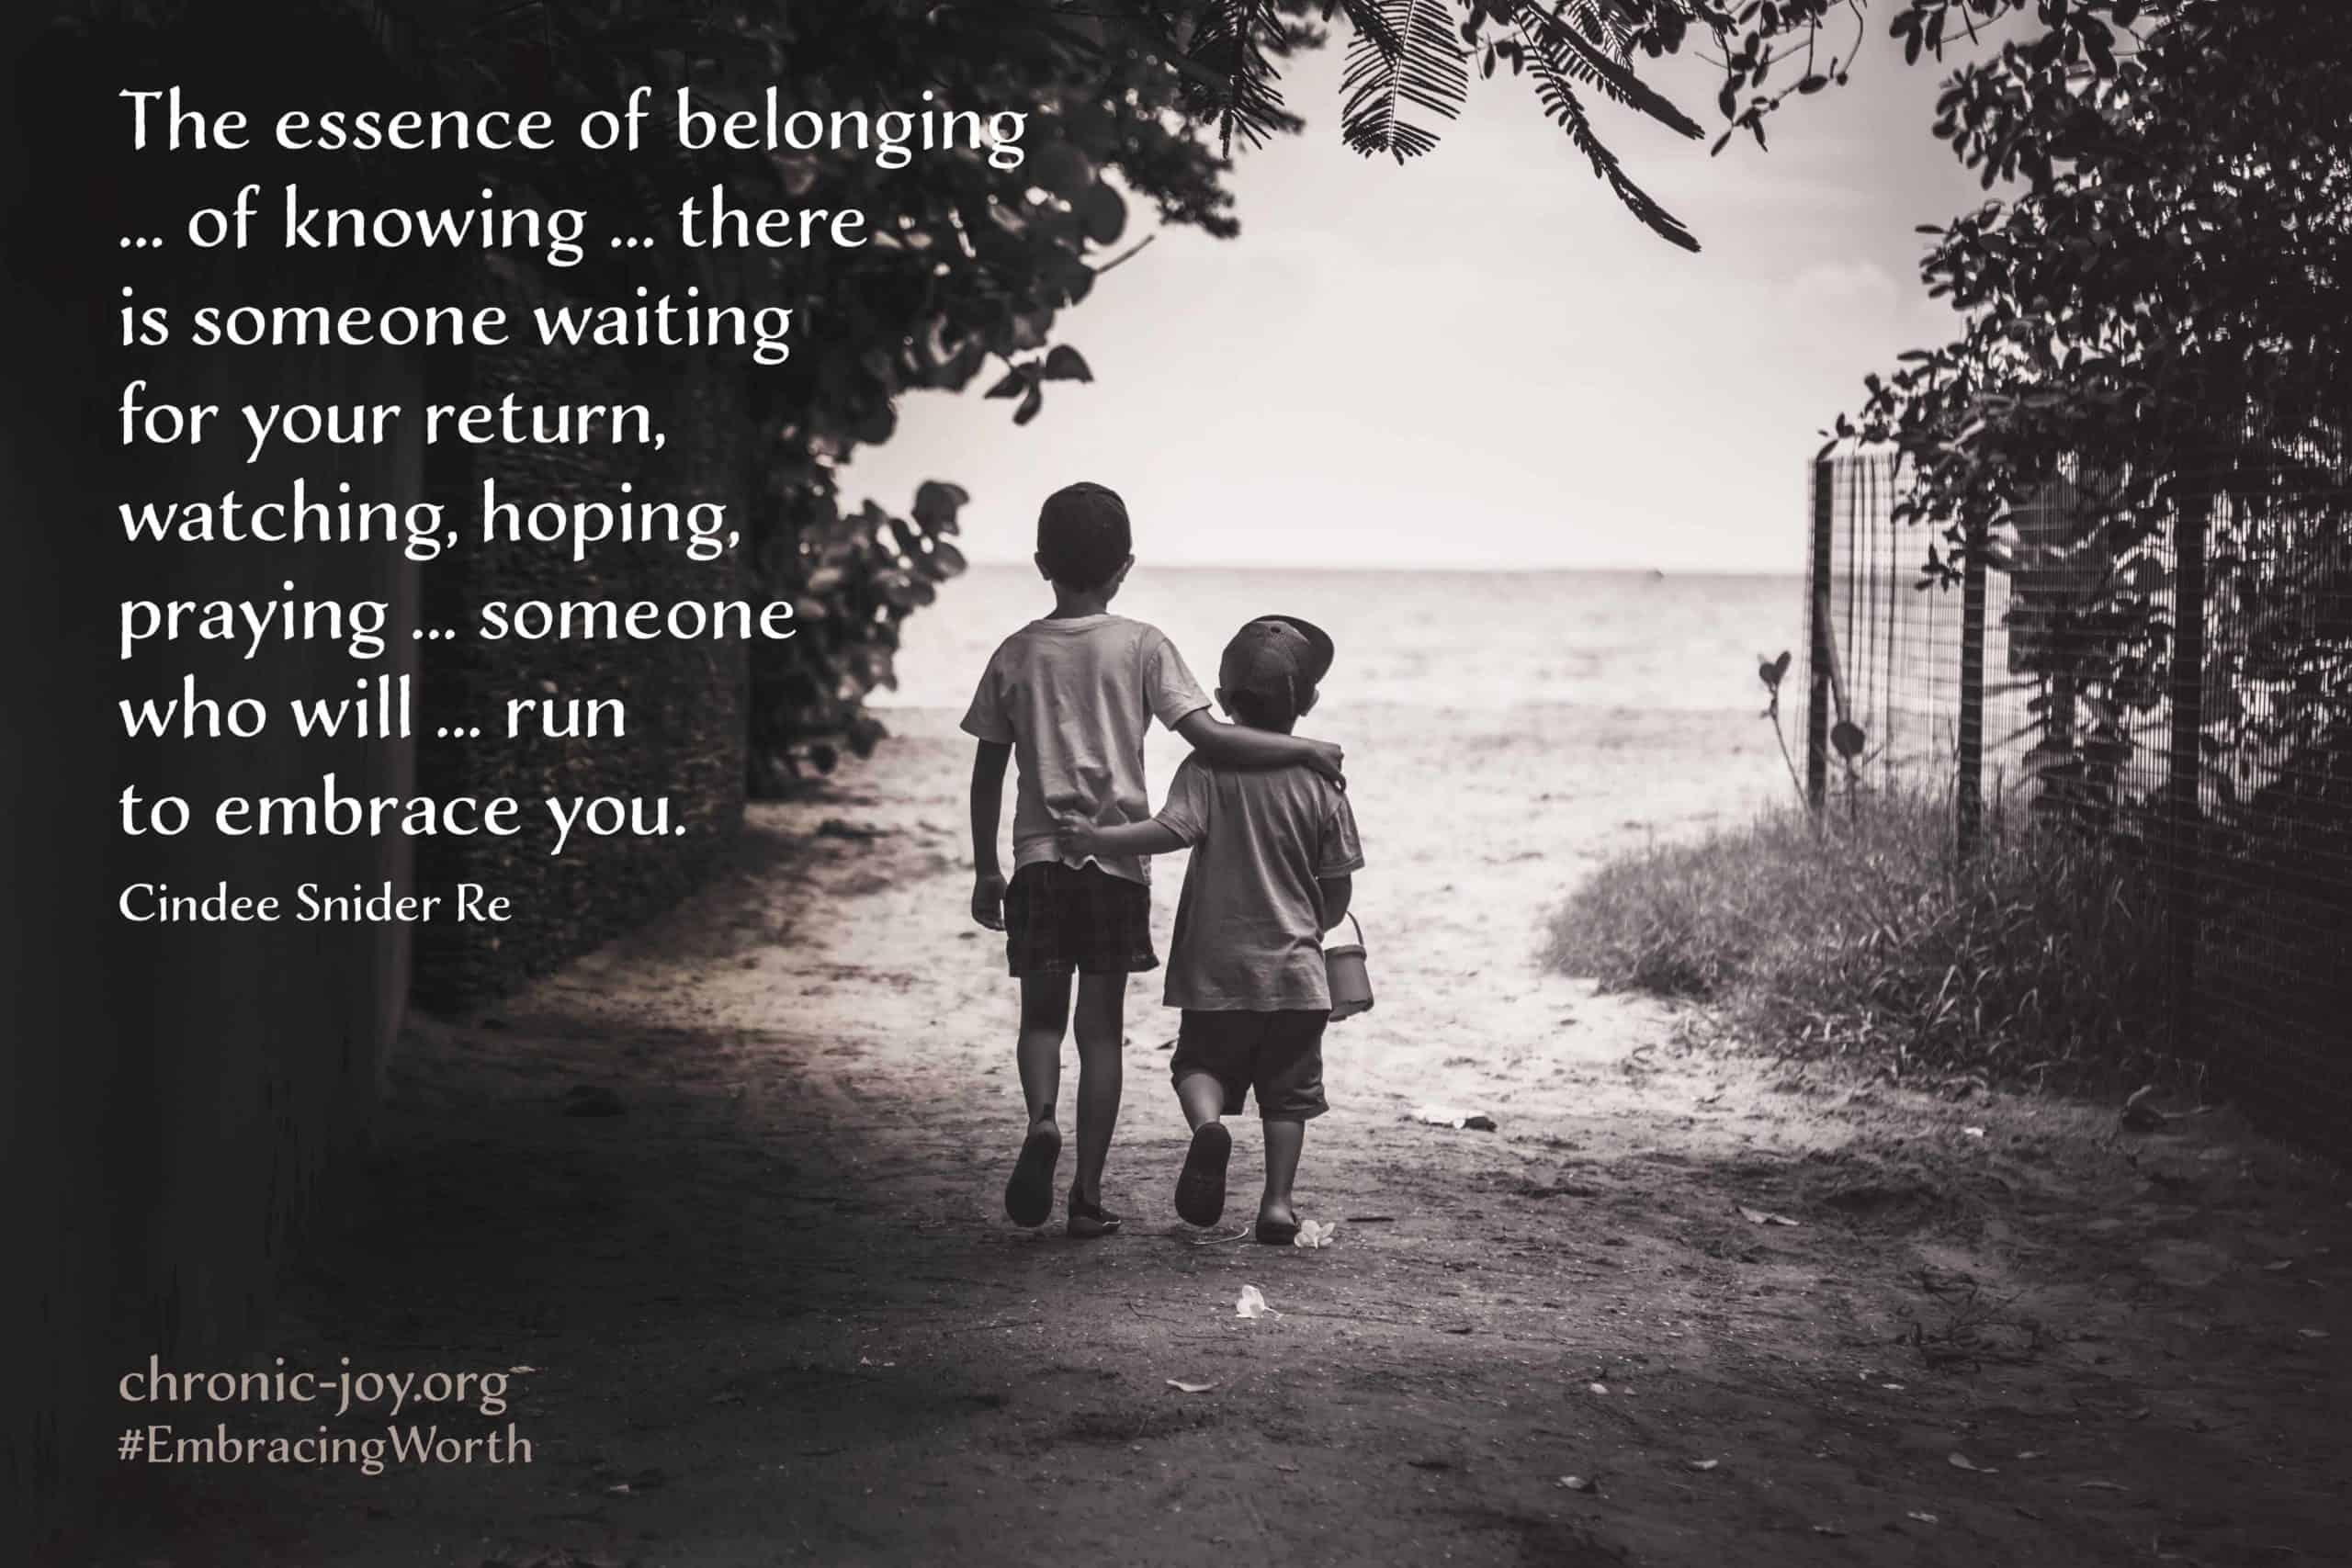 Run to embrace